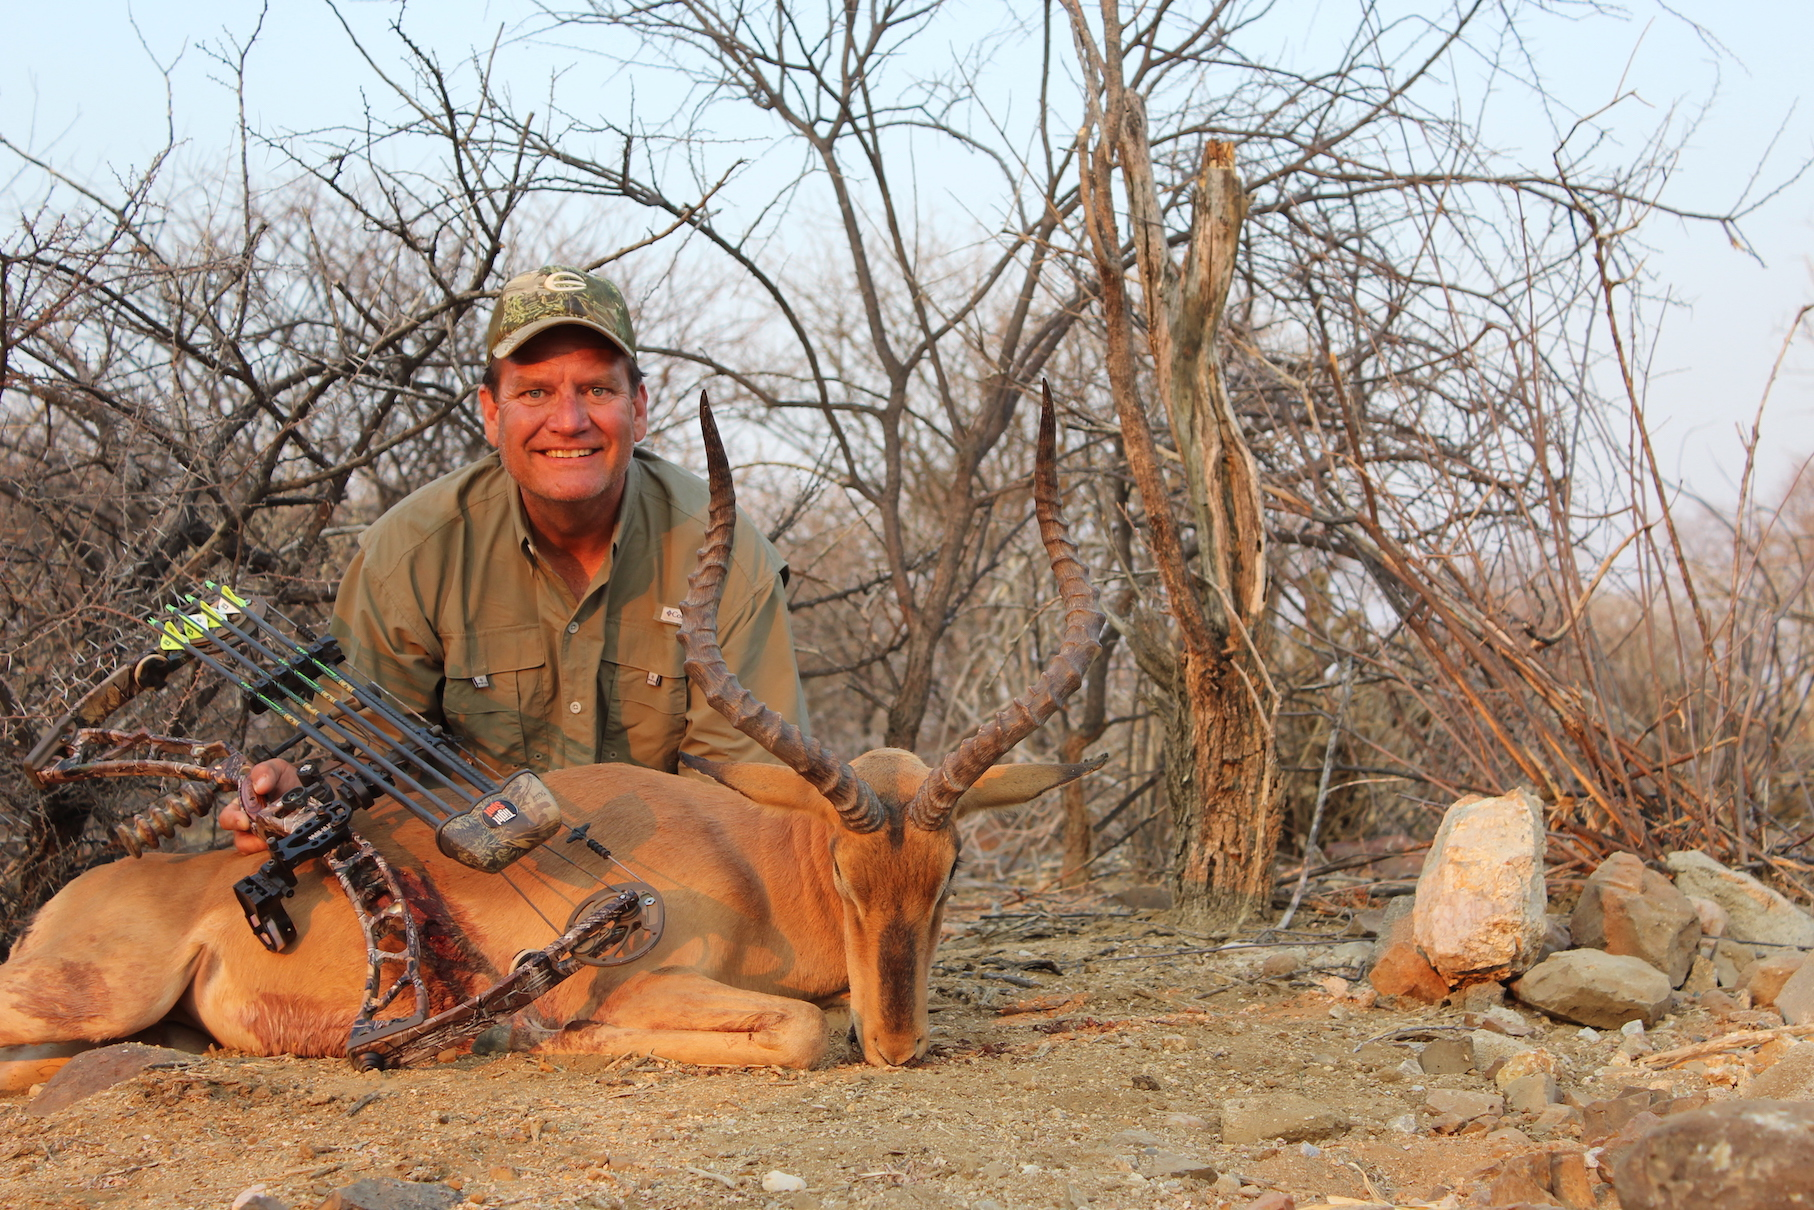 John Brim - USA Namibia Trophy Hunting